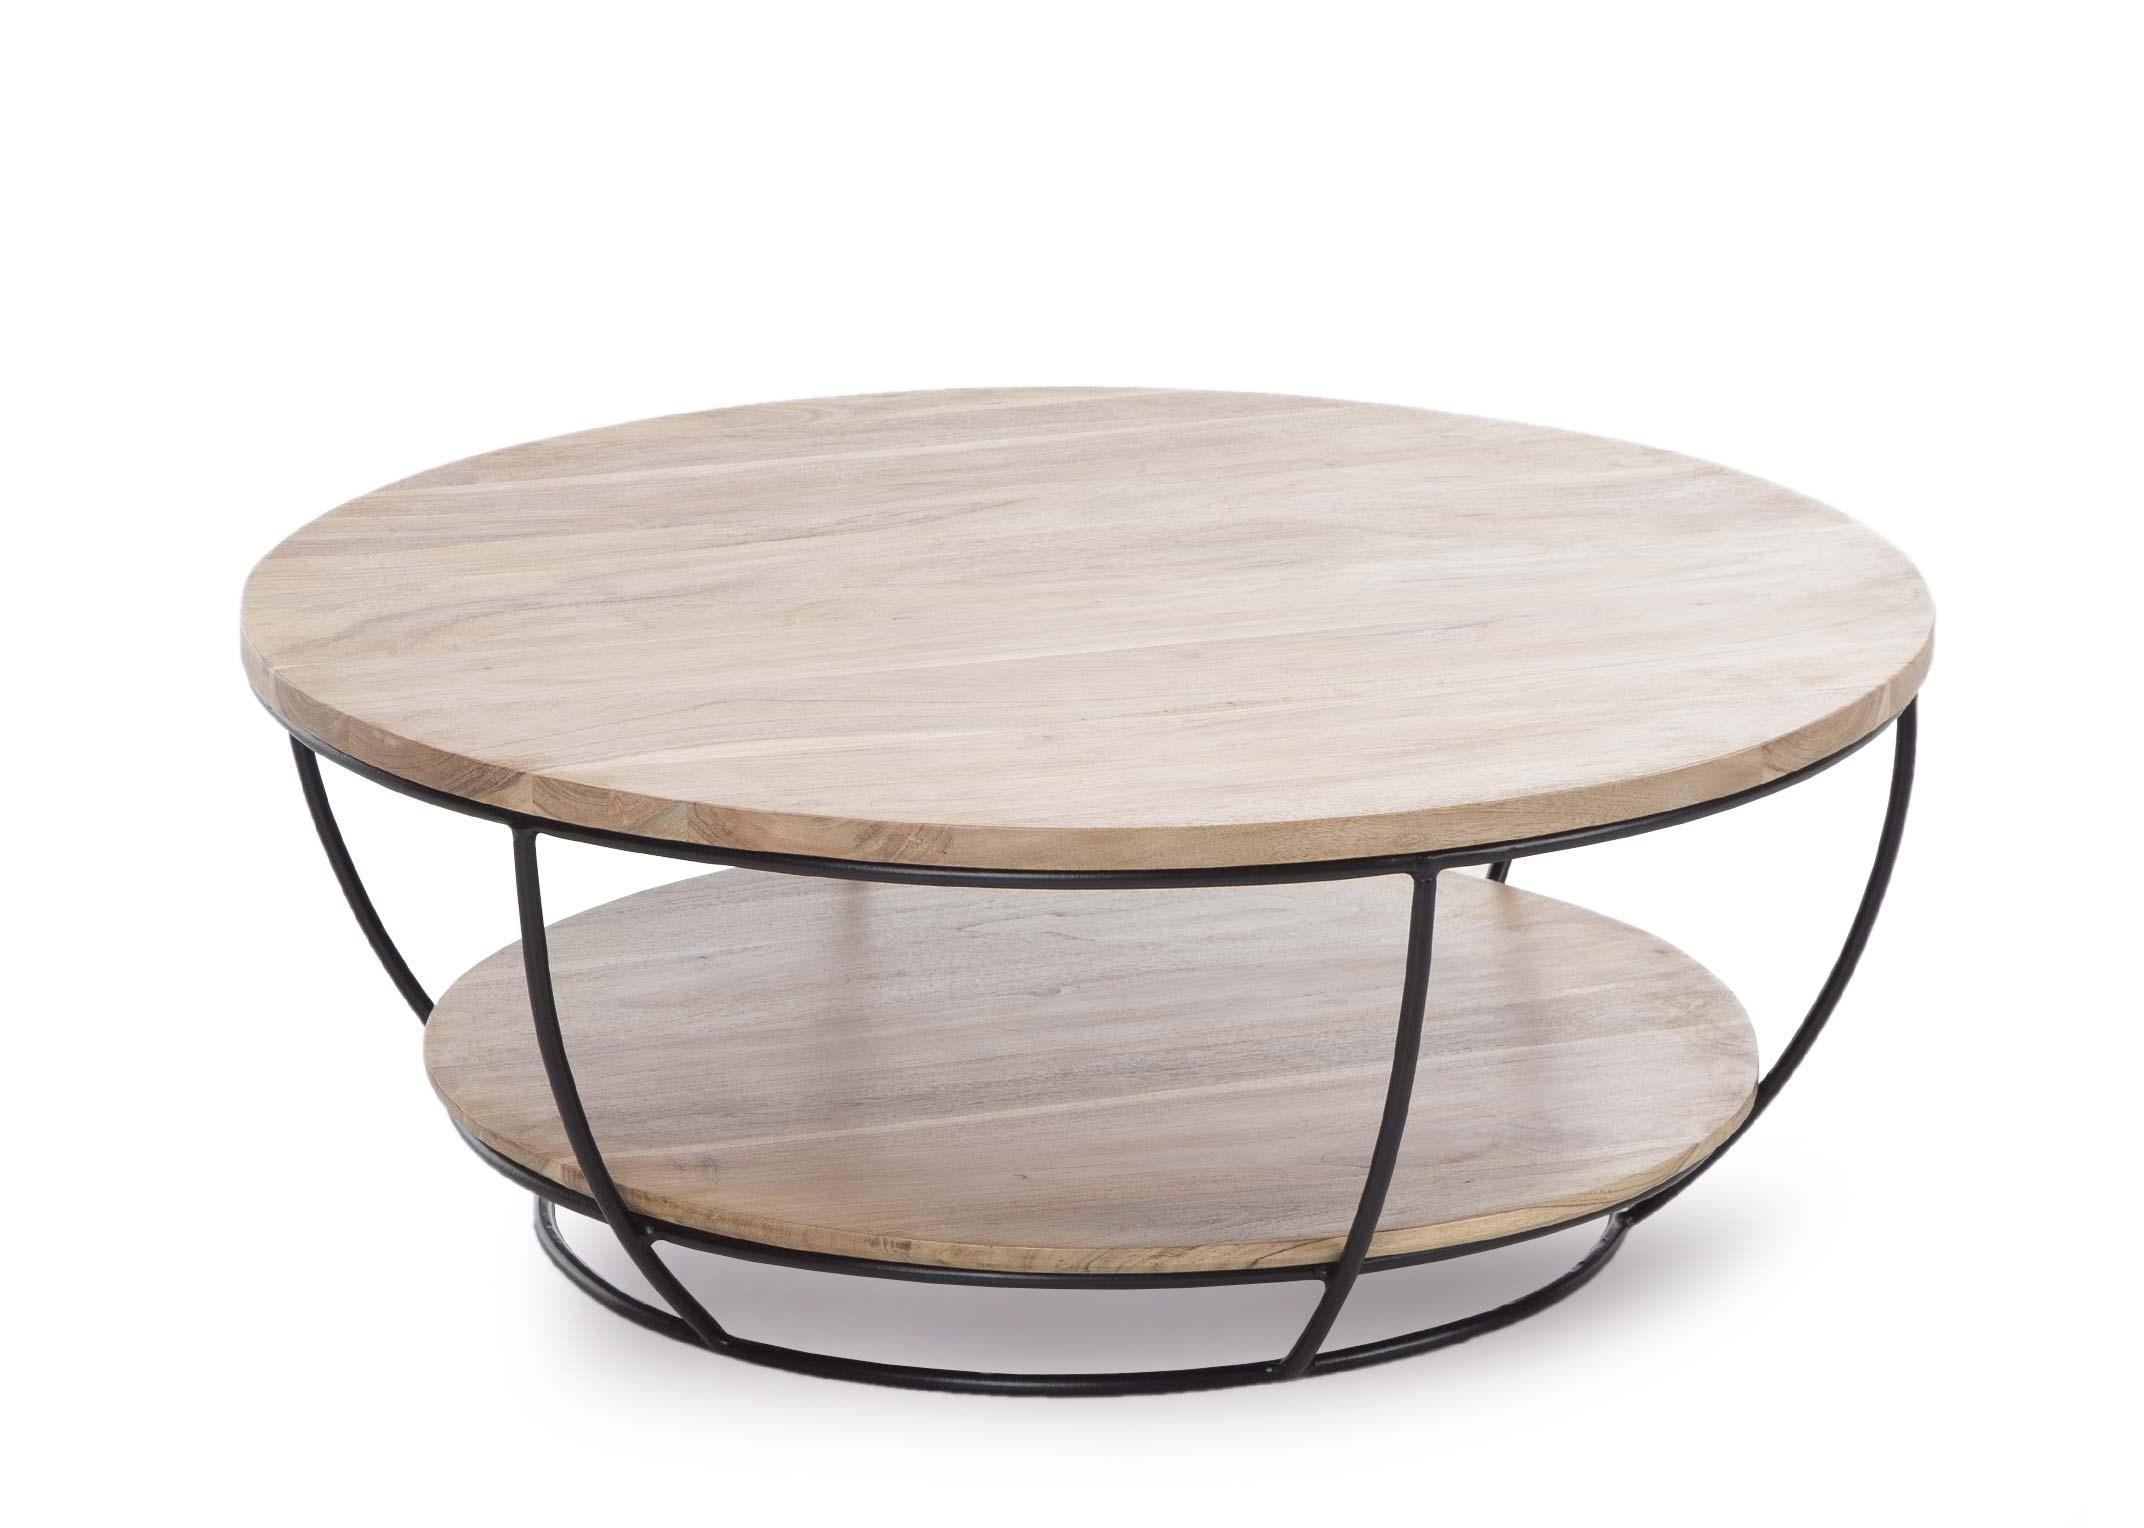 double top round coffee table malta